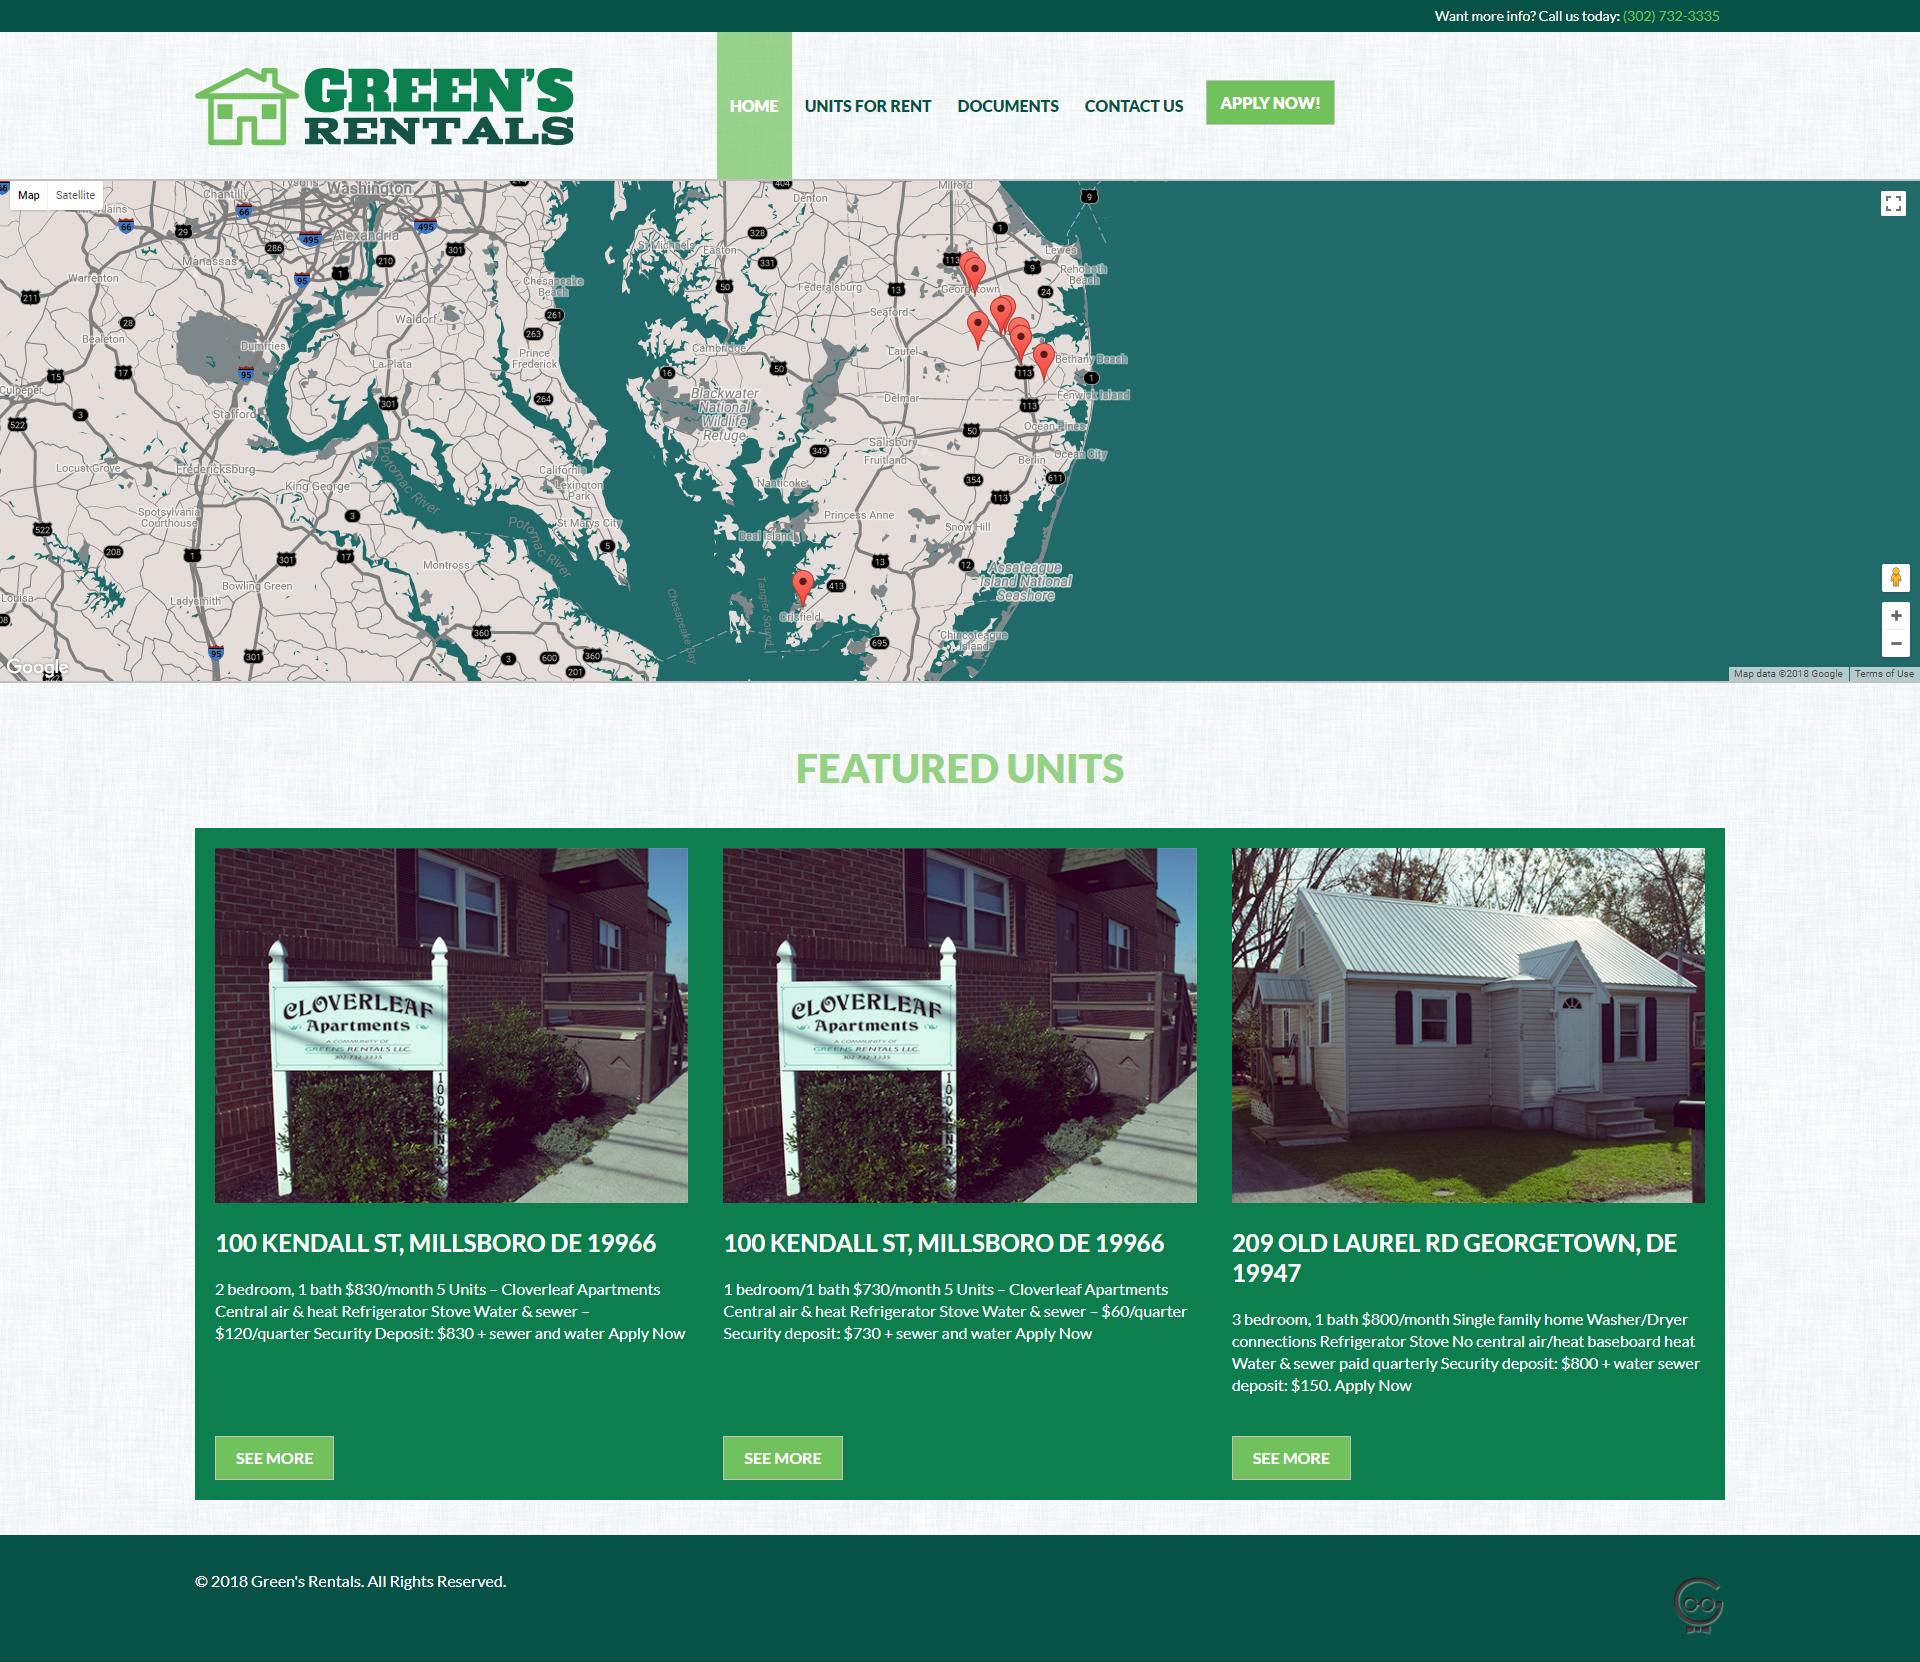 Green's Rentals homepage